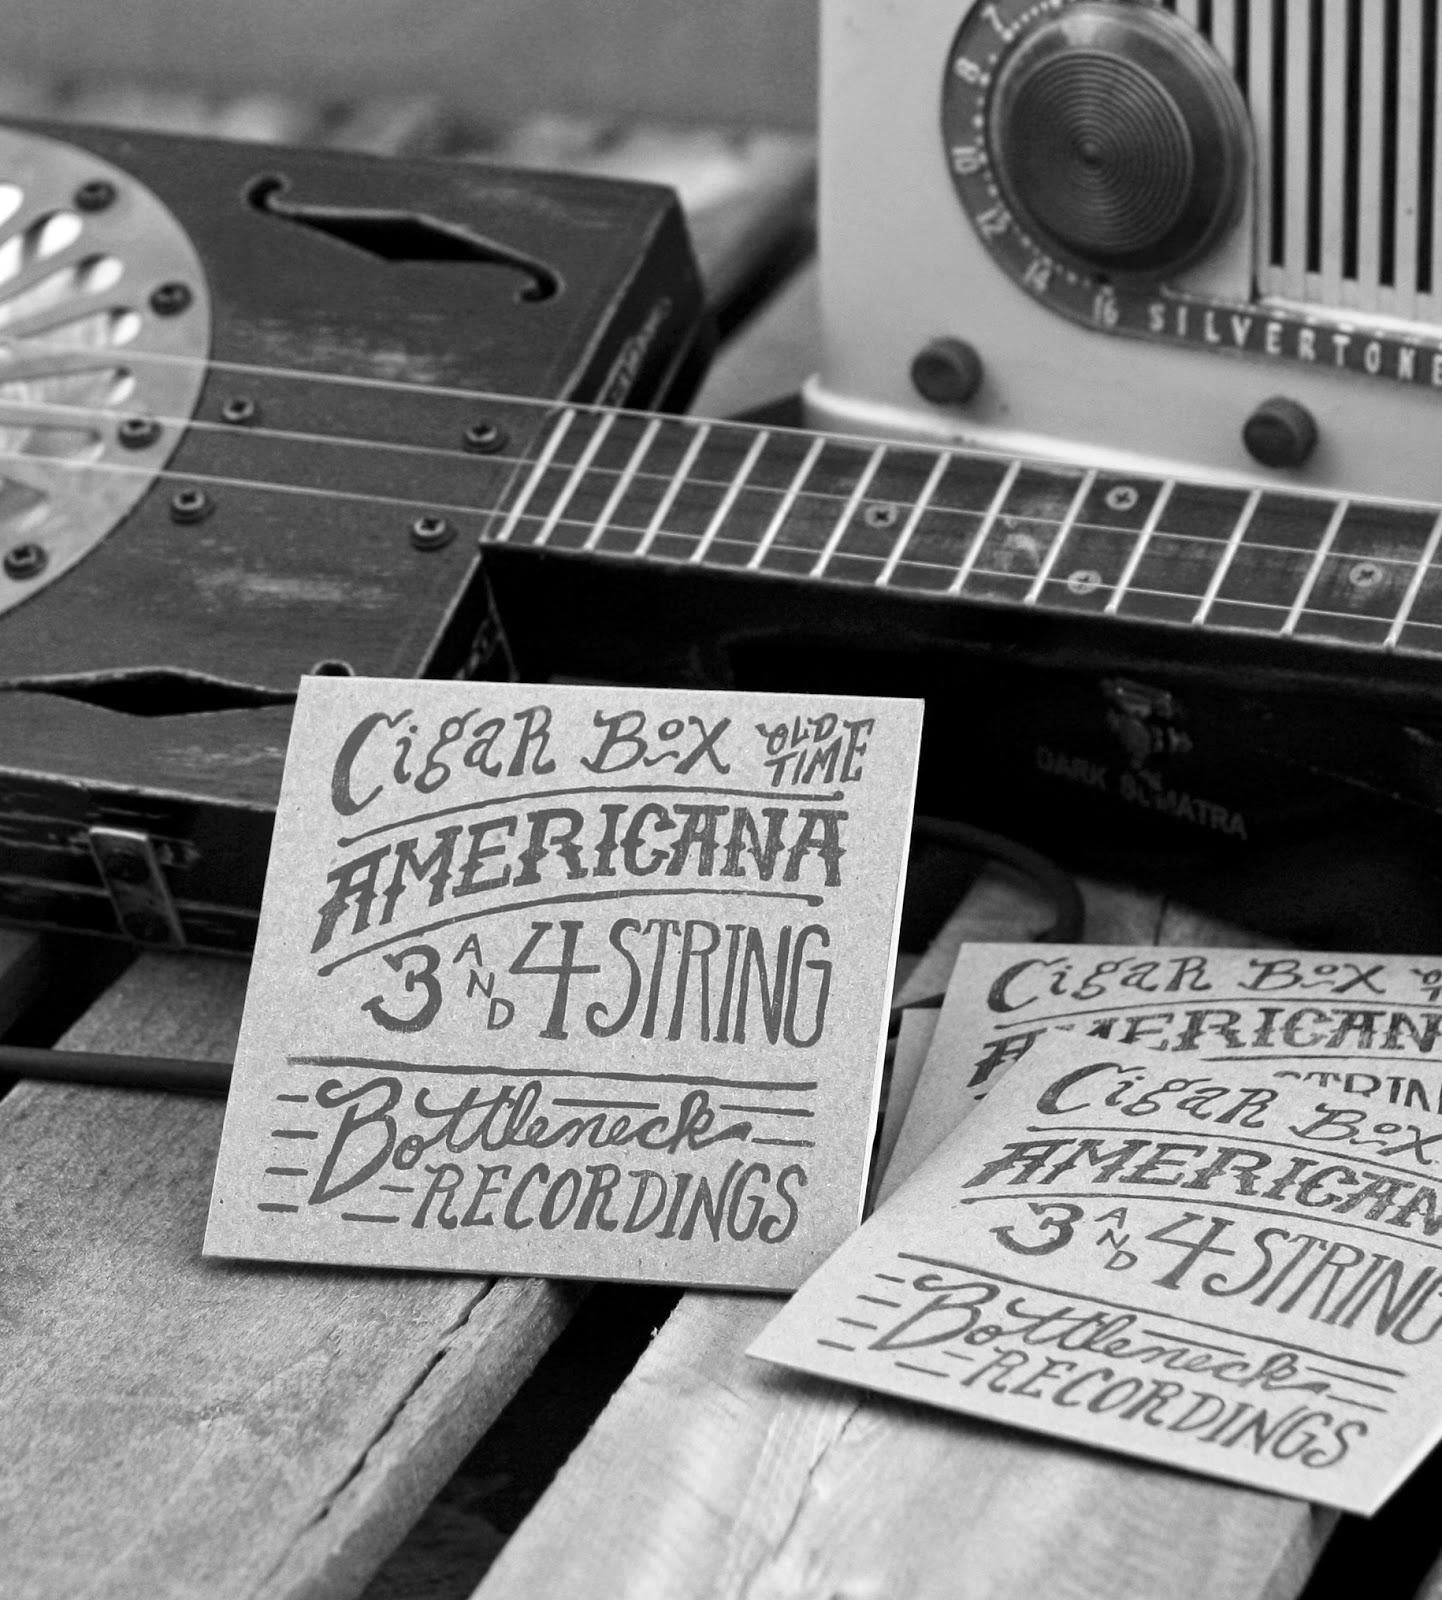 homemade guitars blues history cigar box guitars cigar box americana. Black Bedroom Furniture Sets. Home Design Ideas